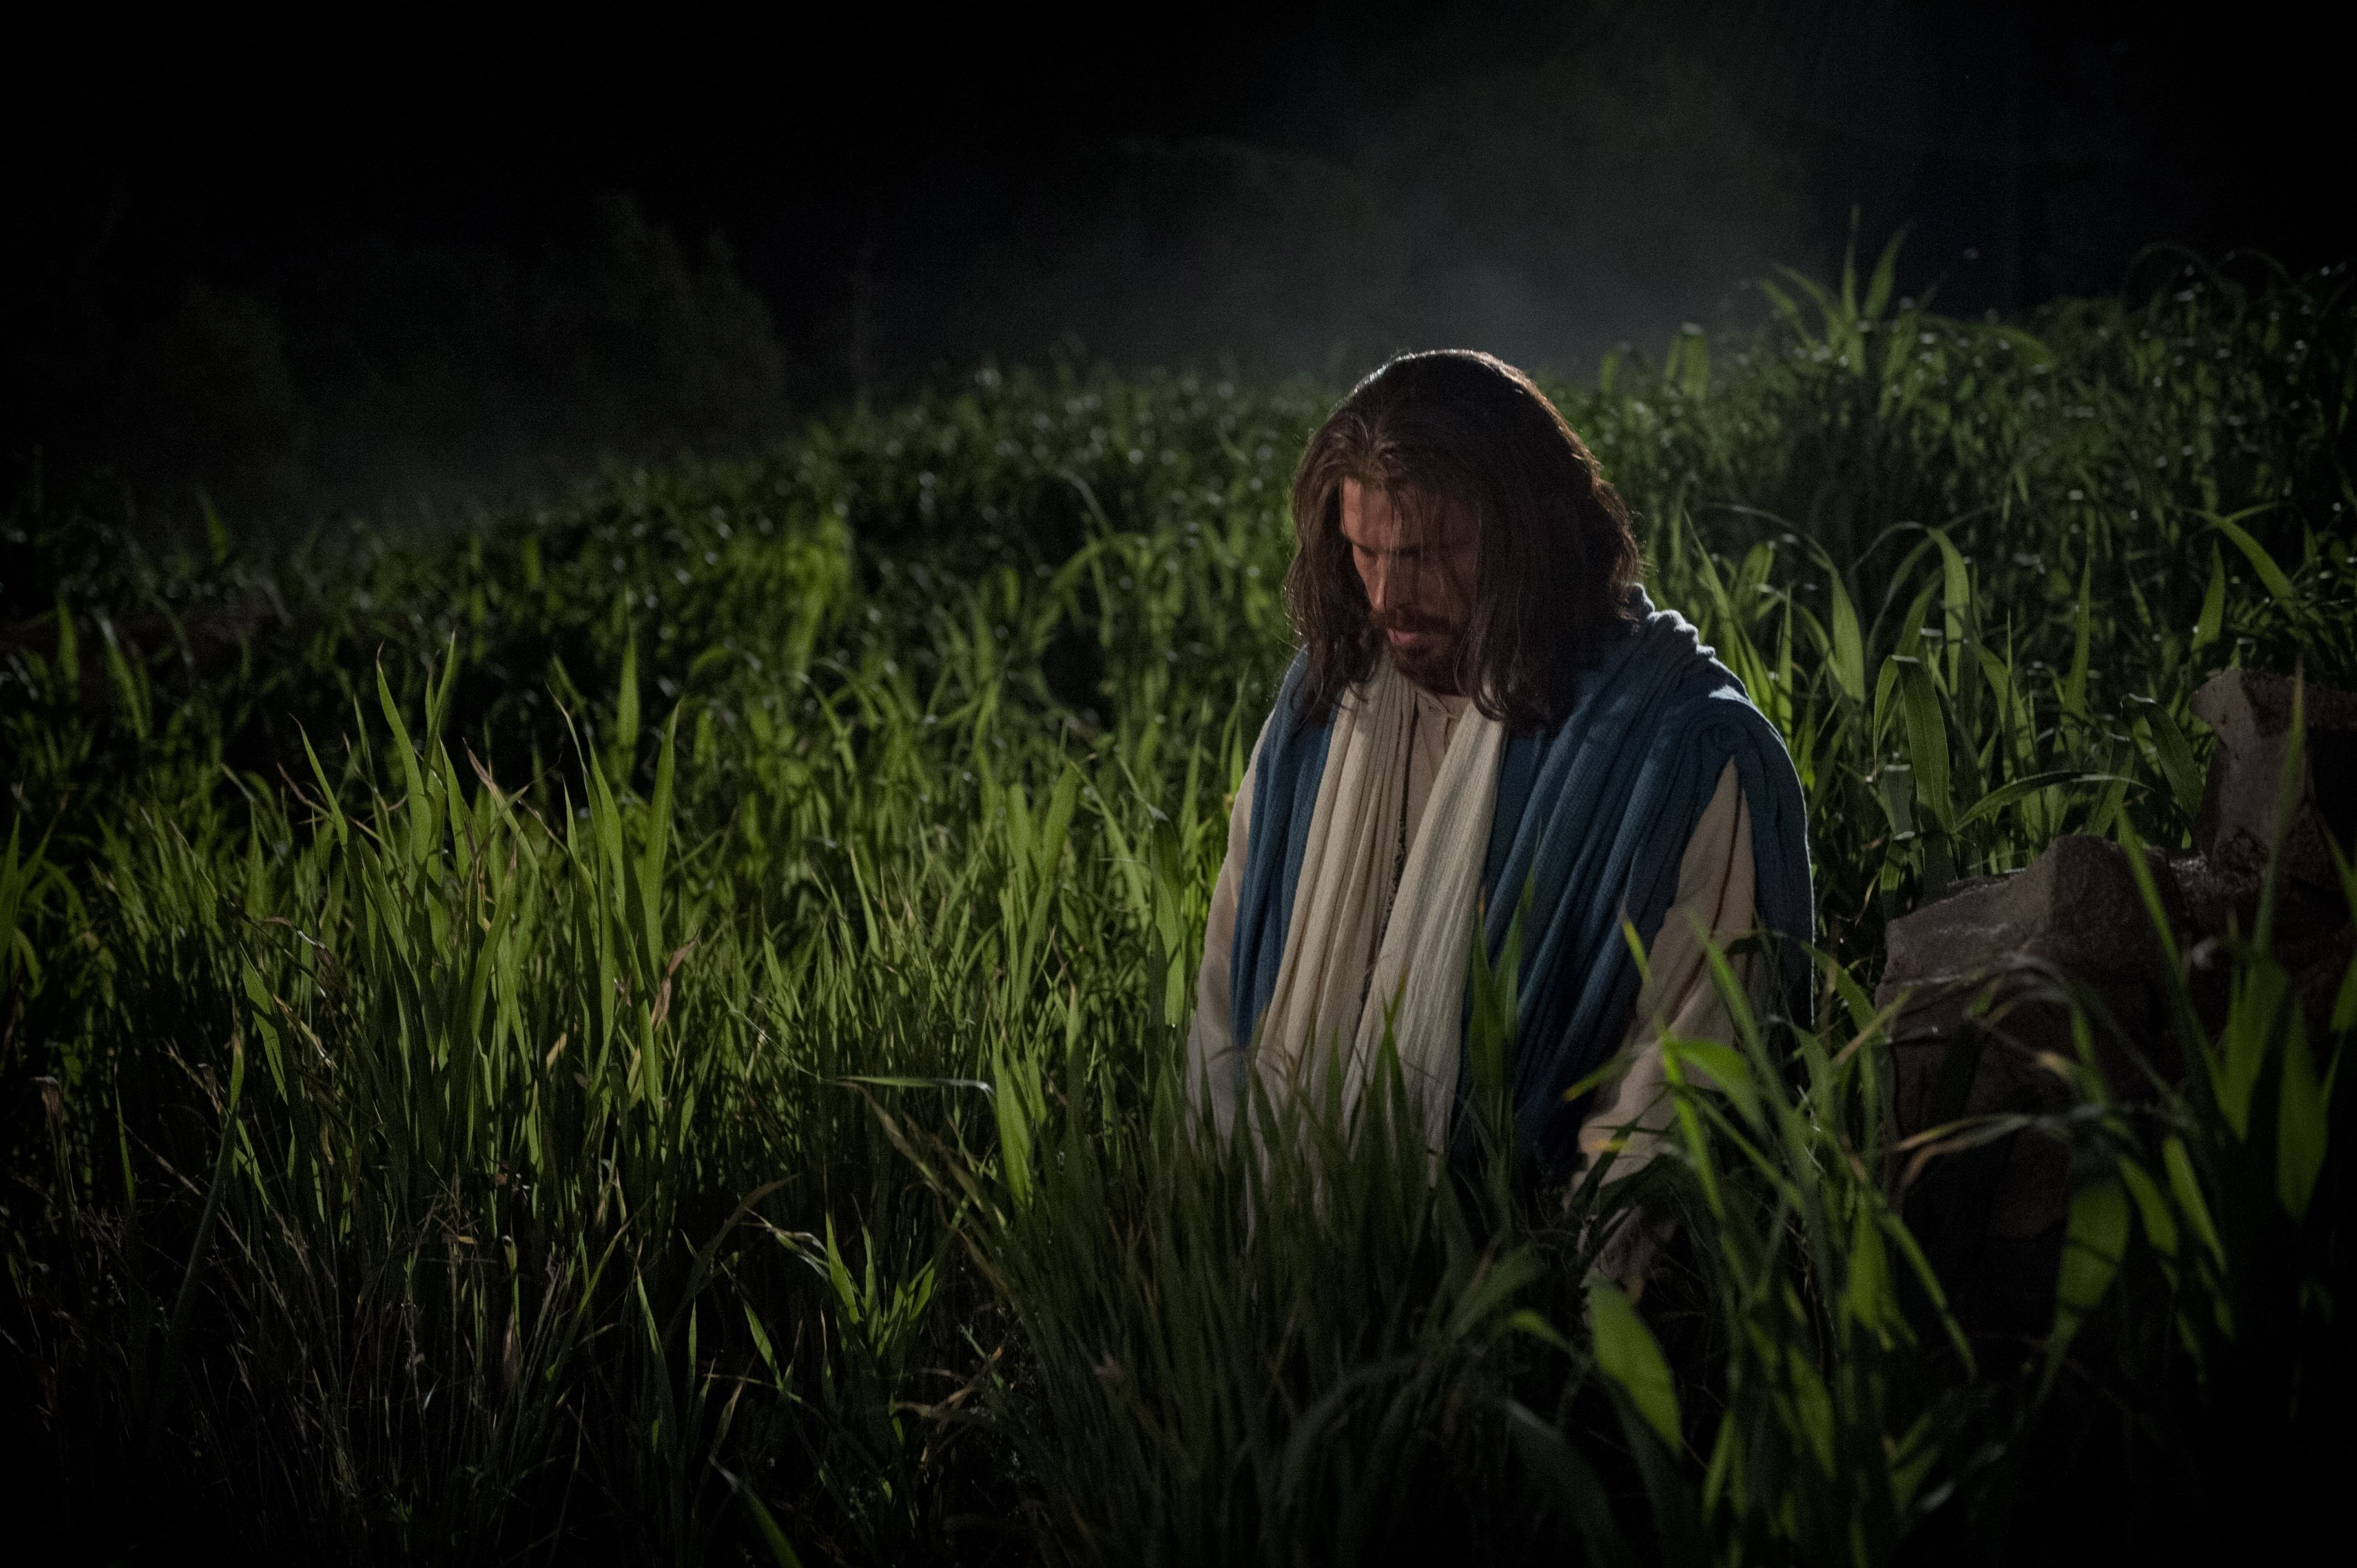 Jesus kneels and prays to God in the Garden of Gethsemane.